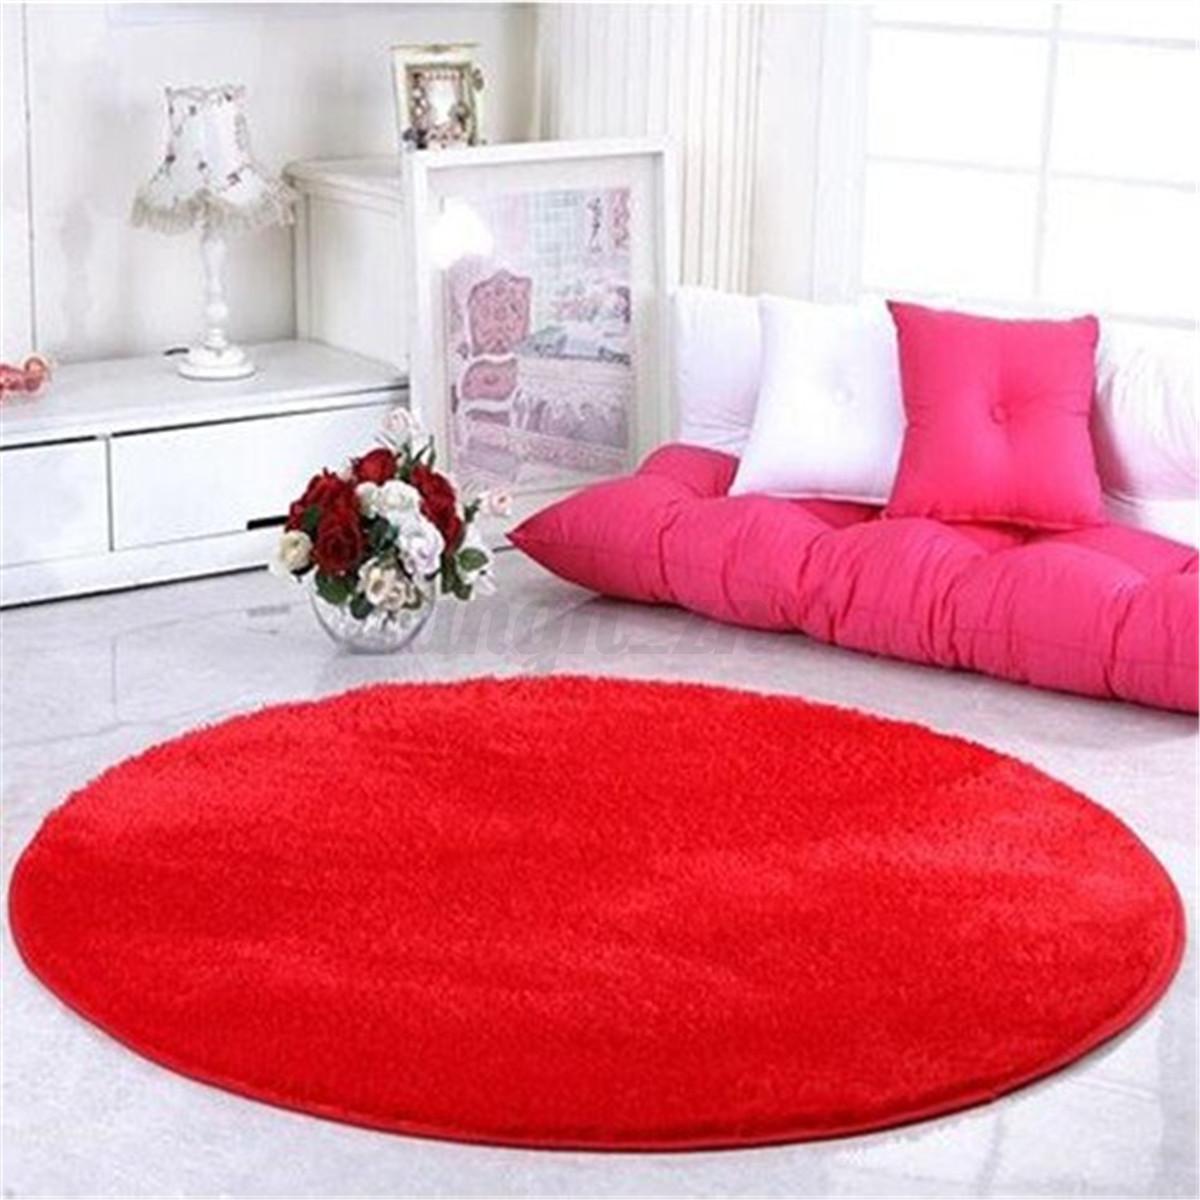 Bedroom With Red Carpet Zen Bedroom Furniture Bedroom Colors Light Purple Vintage Bedroom Curtains: Fluffy Circle Round Shag Plush Soft Floor Carpet Pink Red